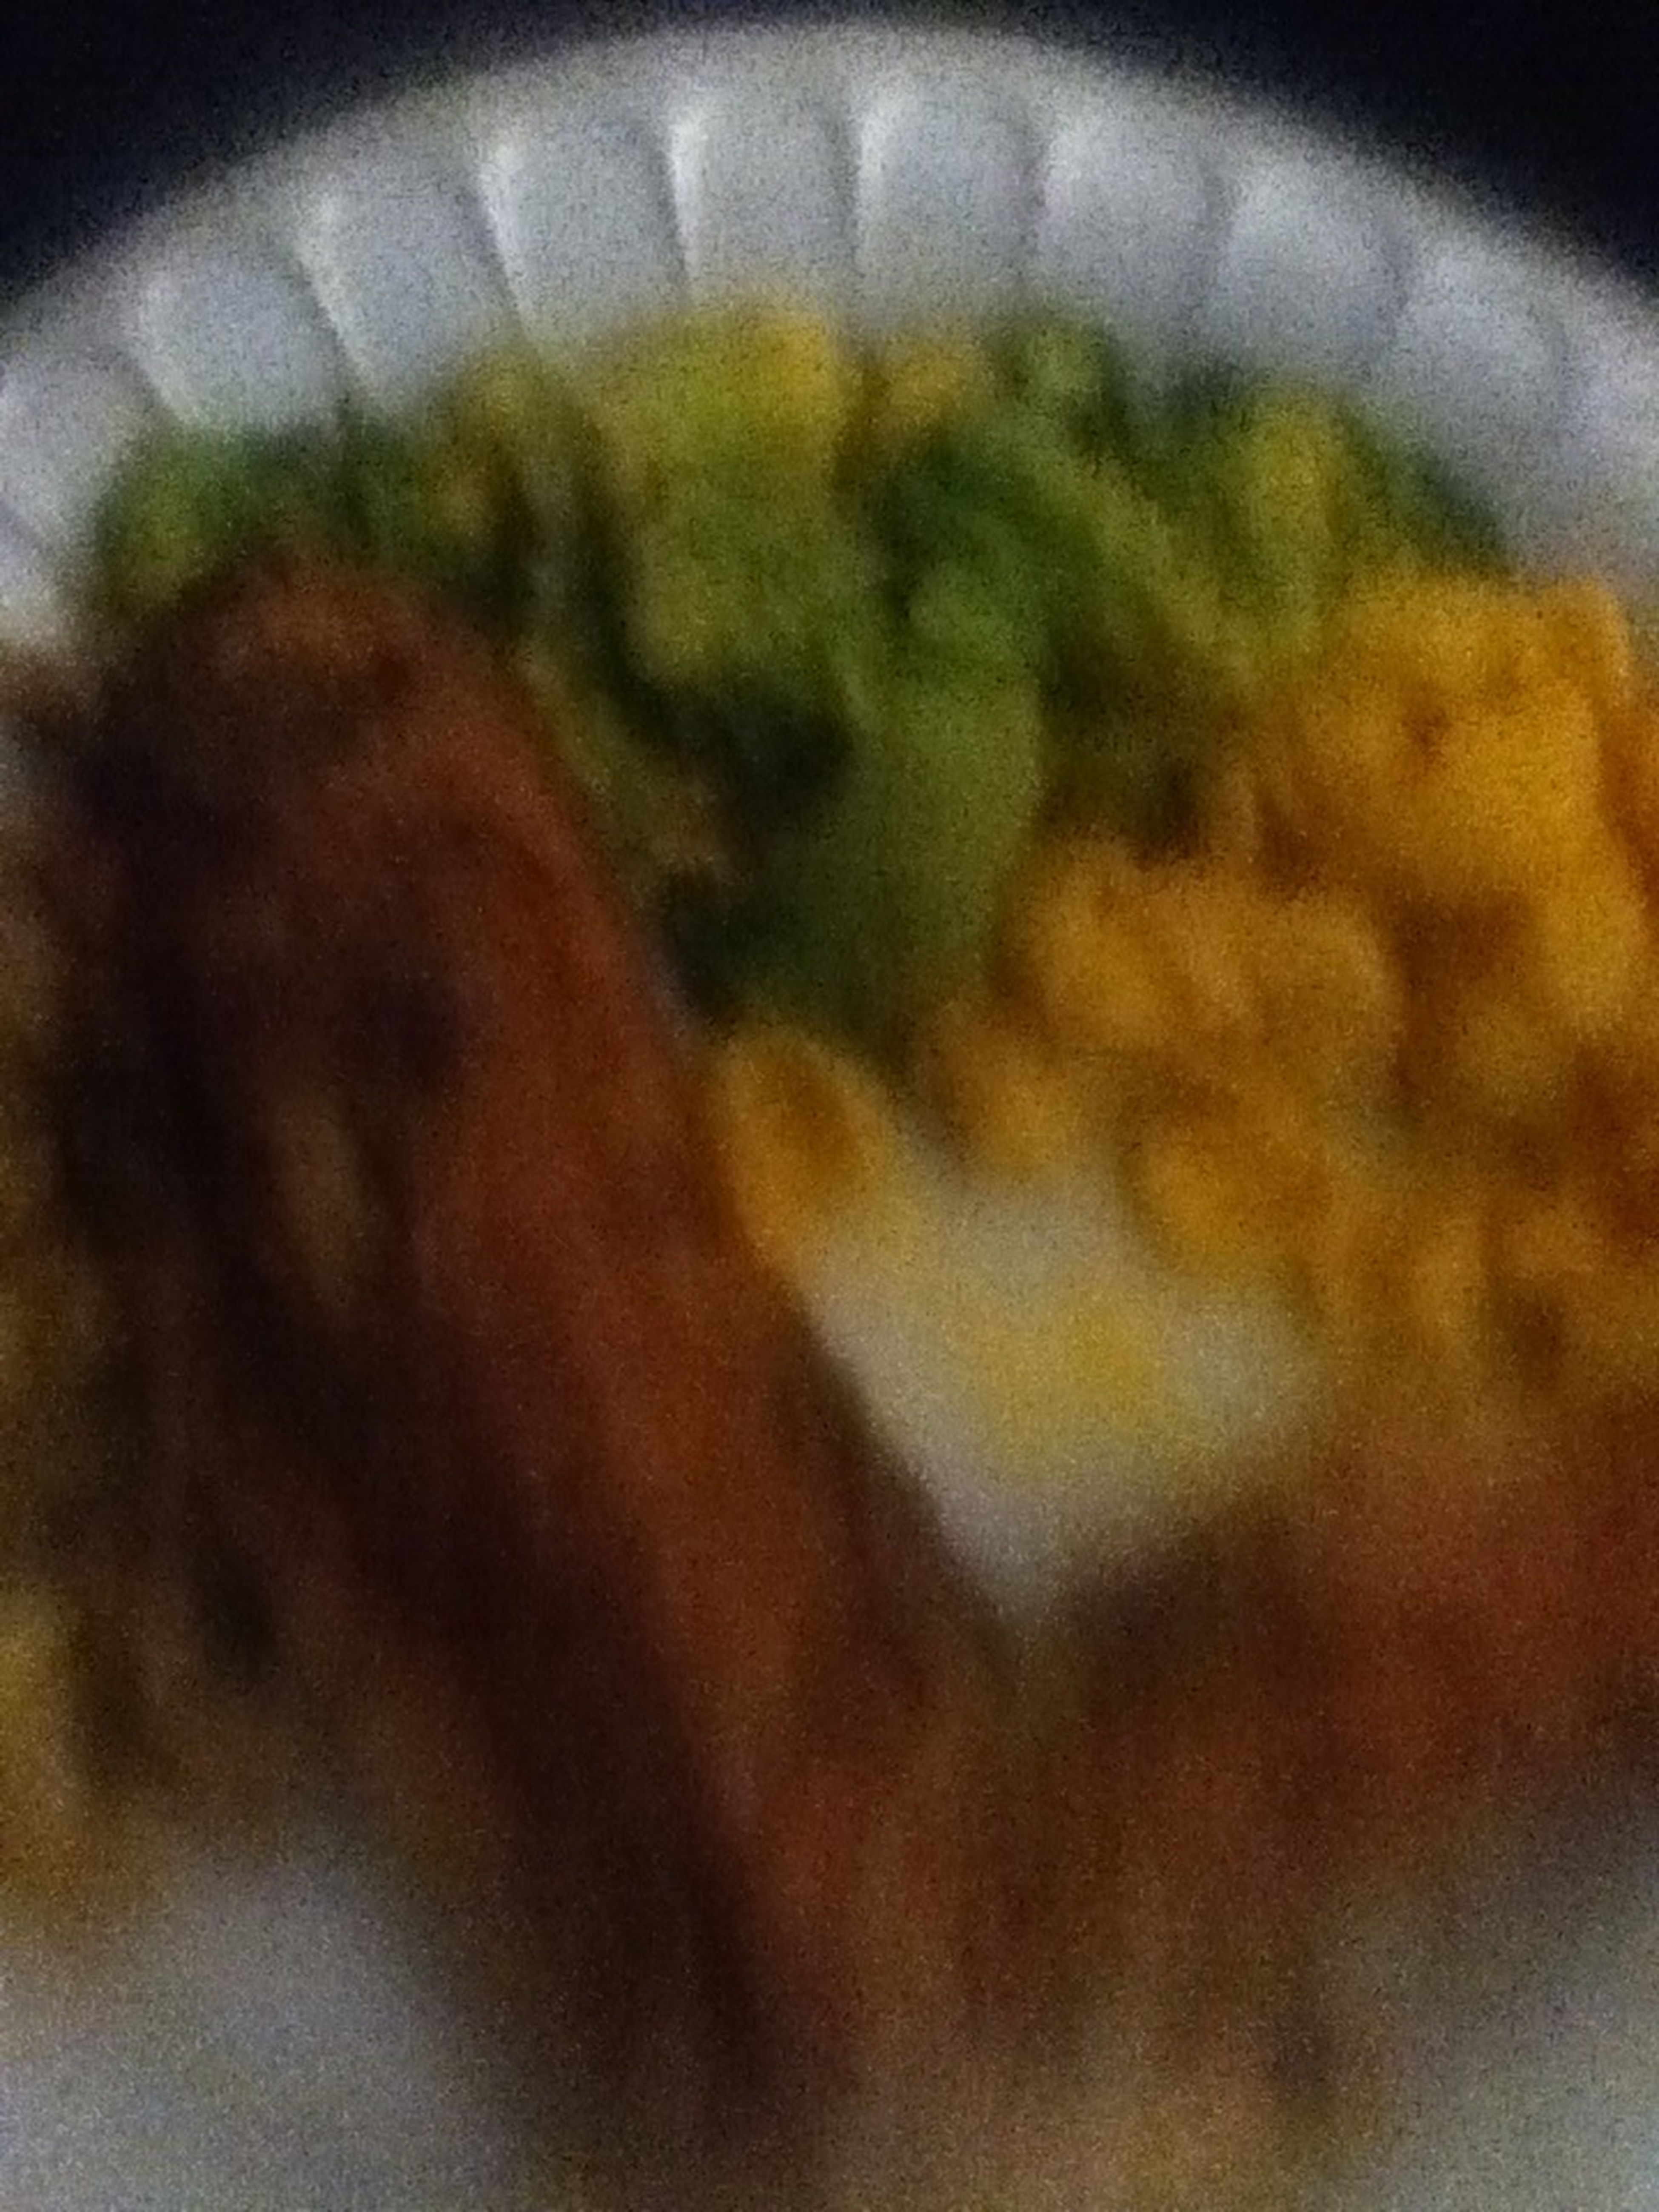 Sunday Dinner!!